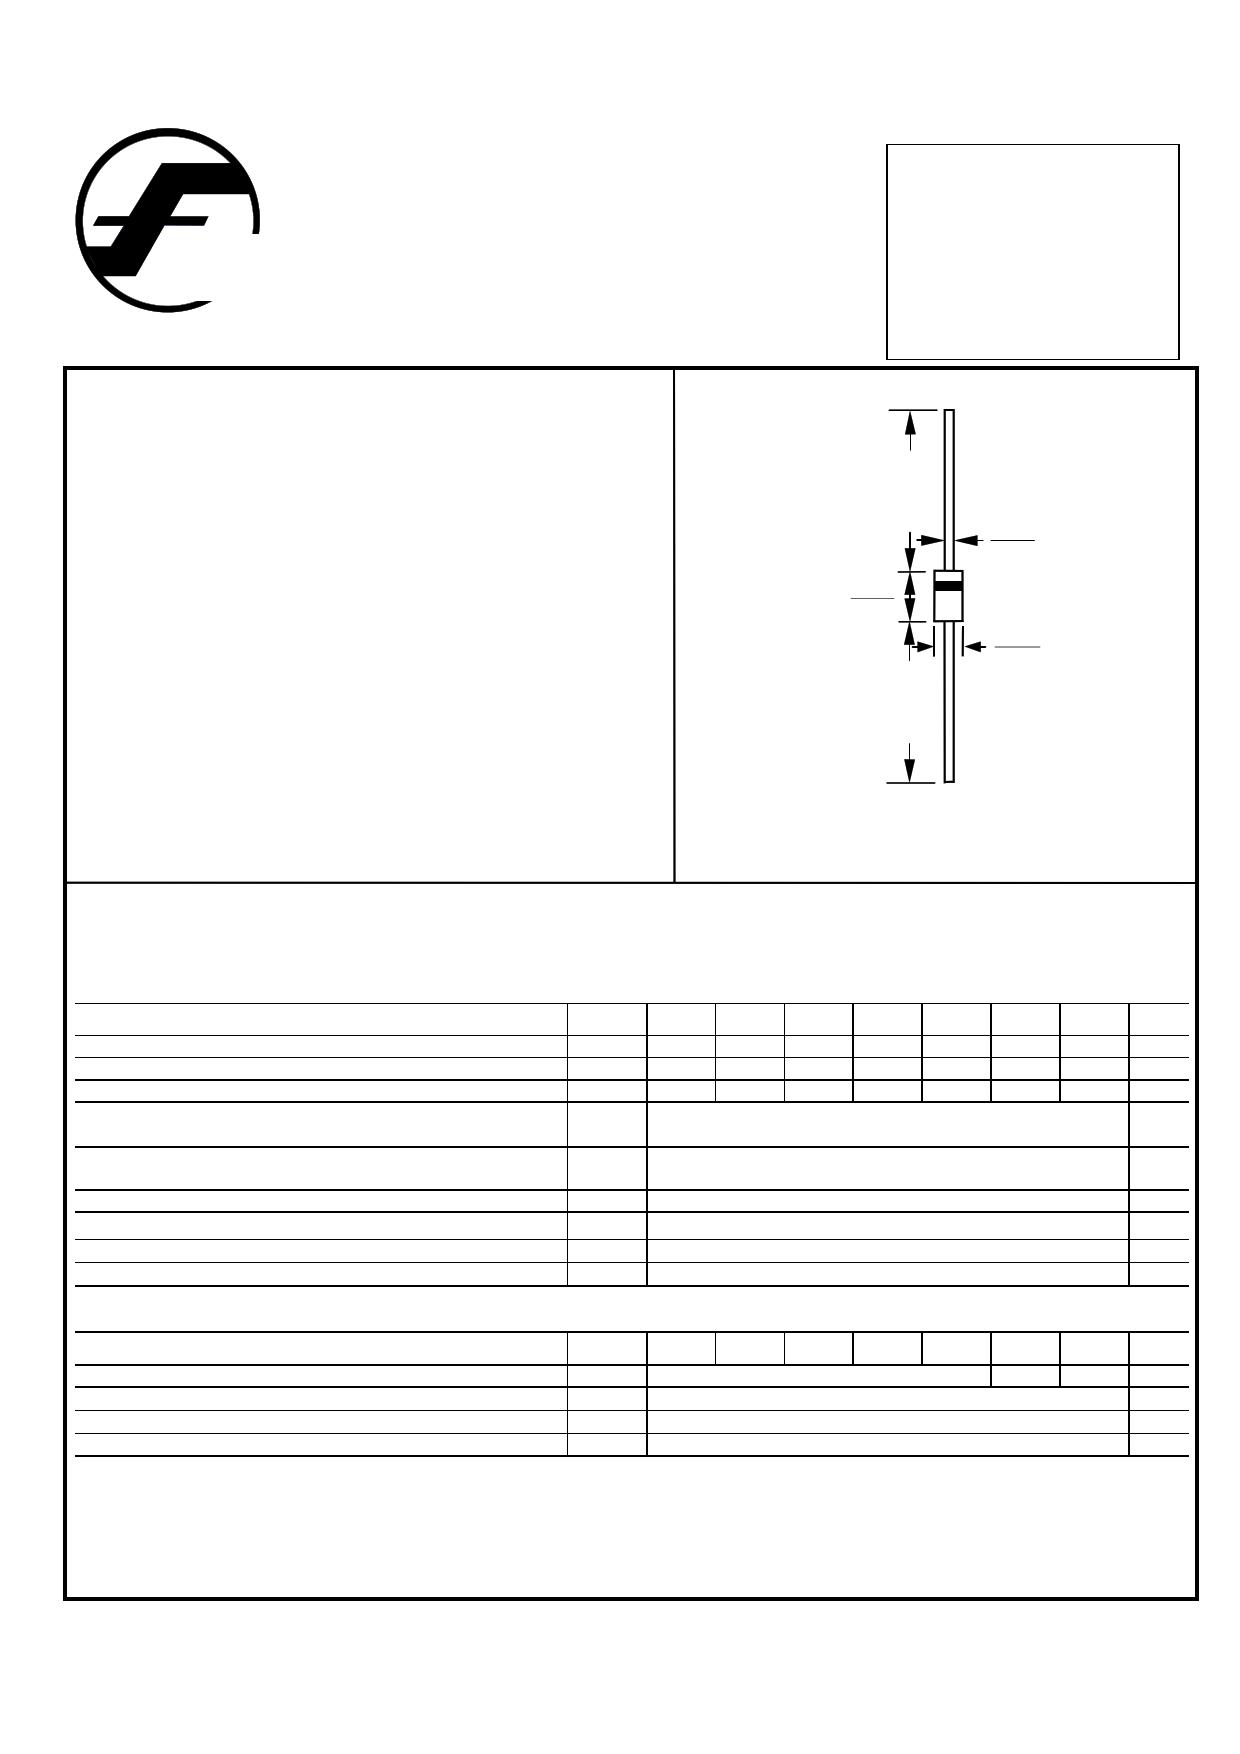 MR8510 데이터시트 및 MR8510 PDF